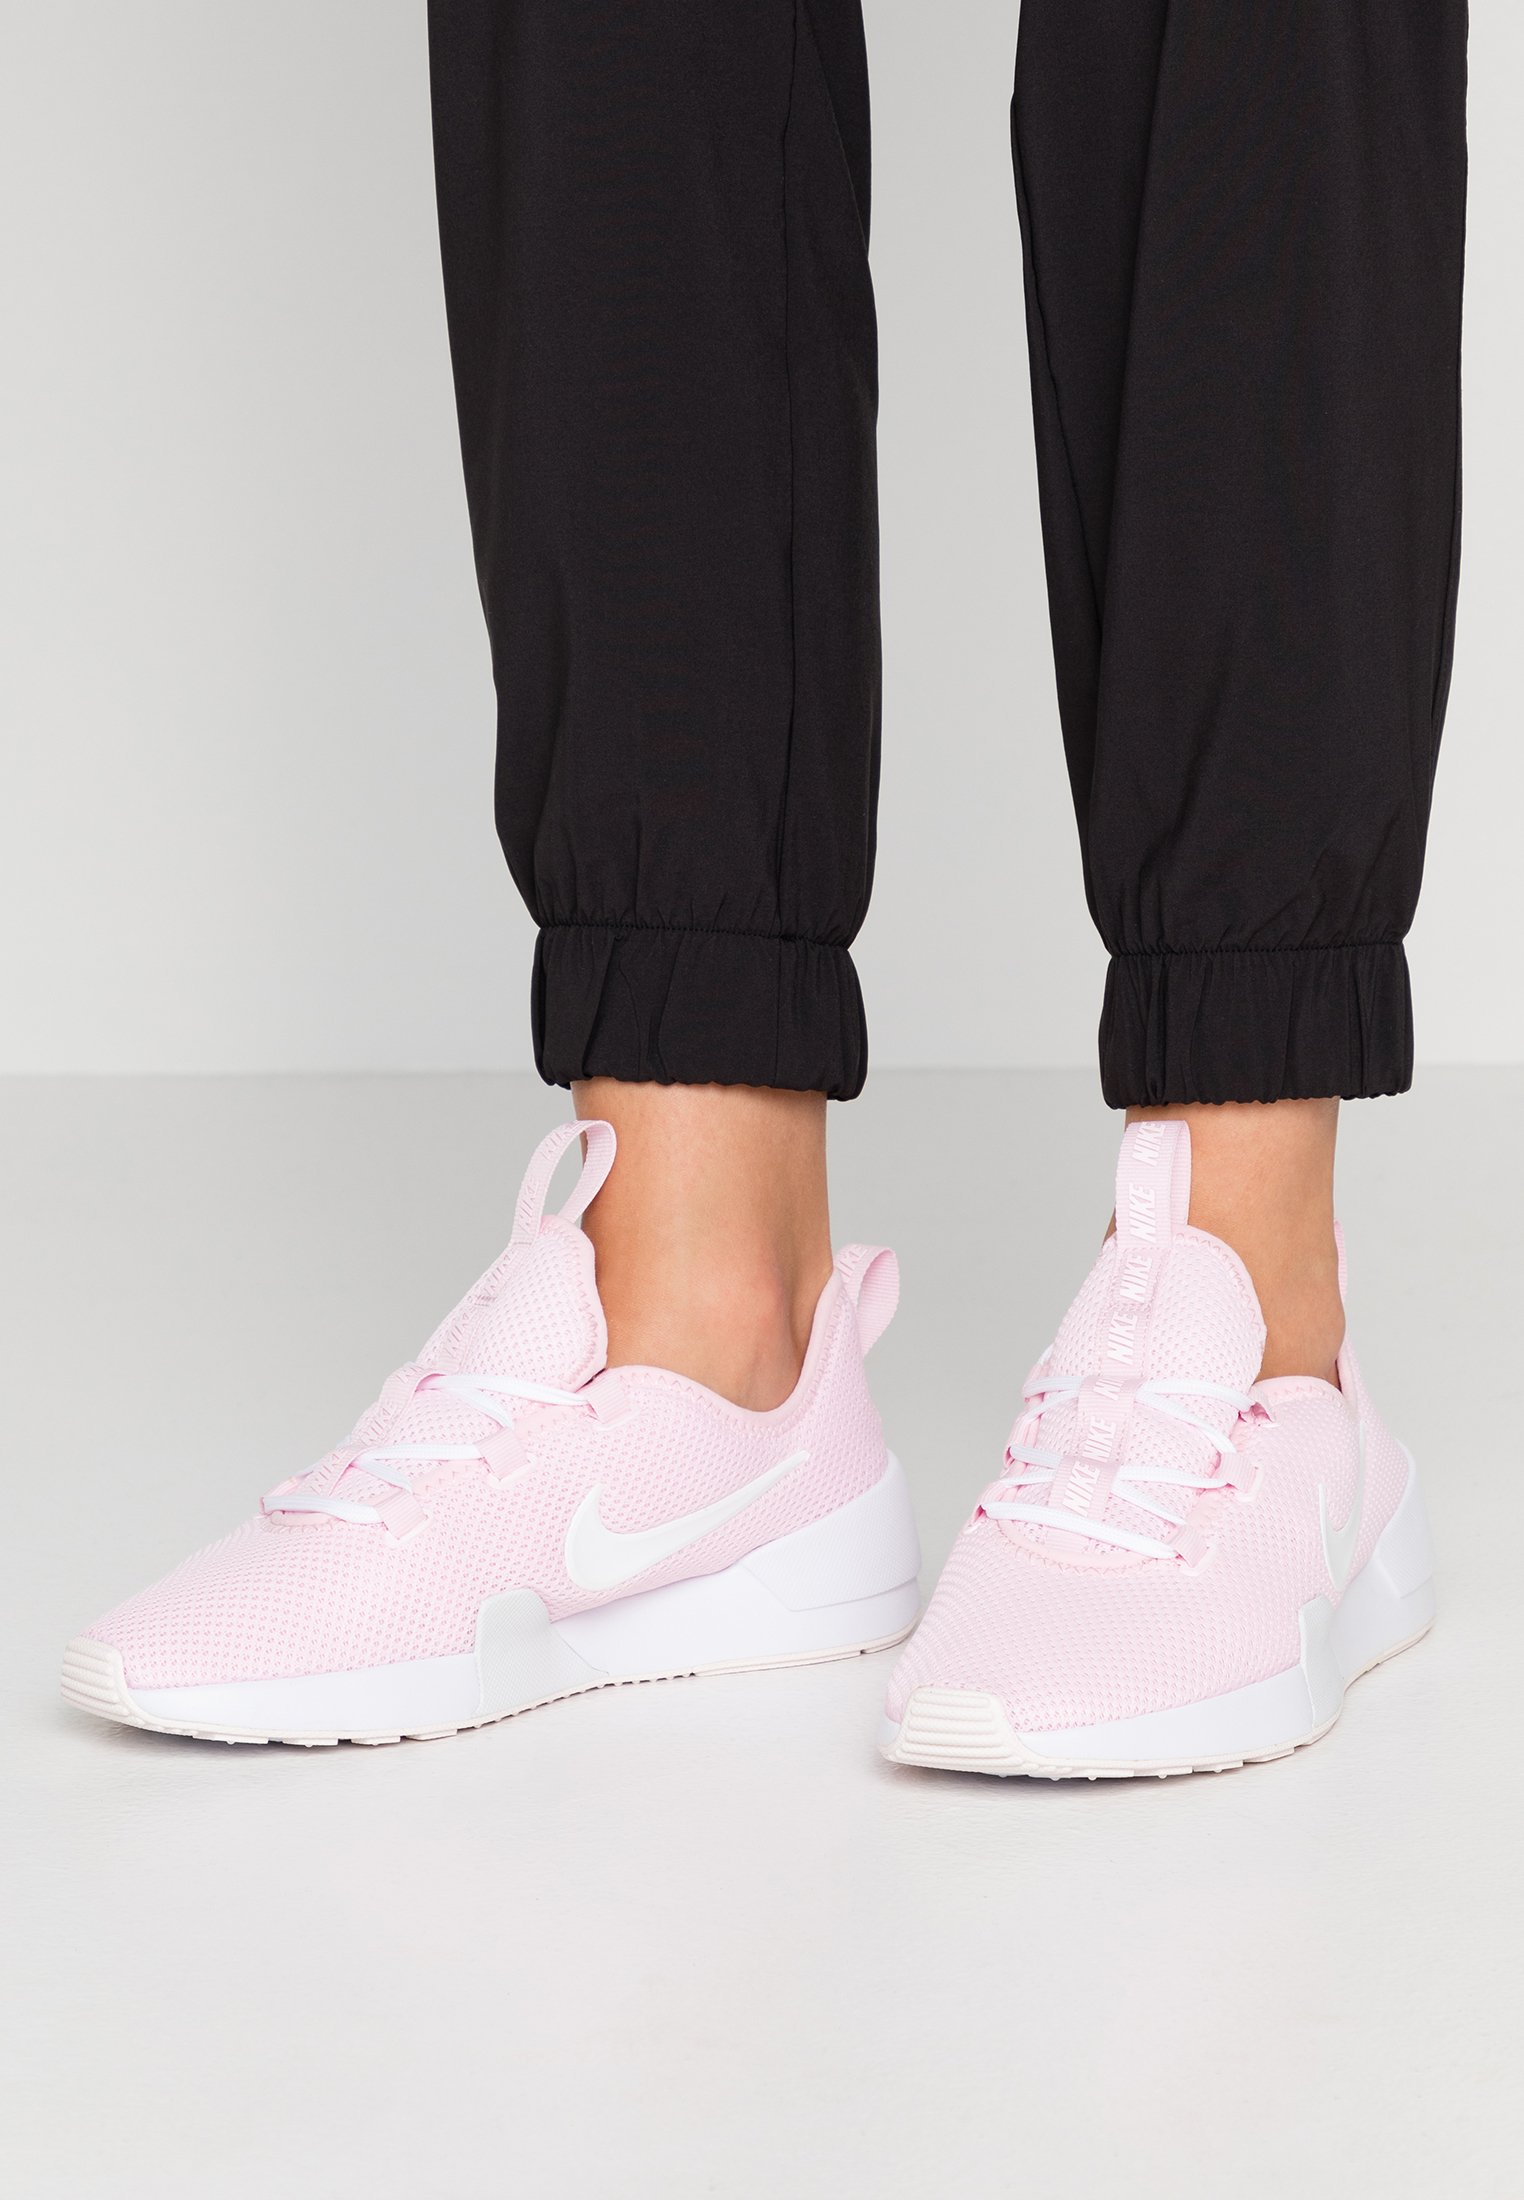 imagina chasquido mecanismo  Nike Sportswear ASHIN MODERN - Trainers - pink/white/pale pink - Zalando.ie